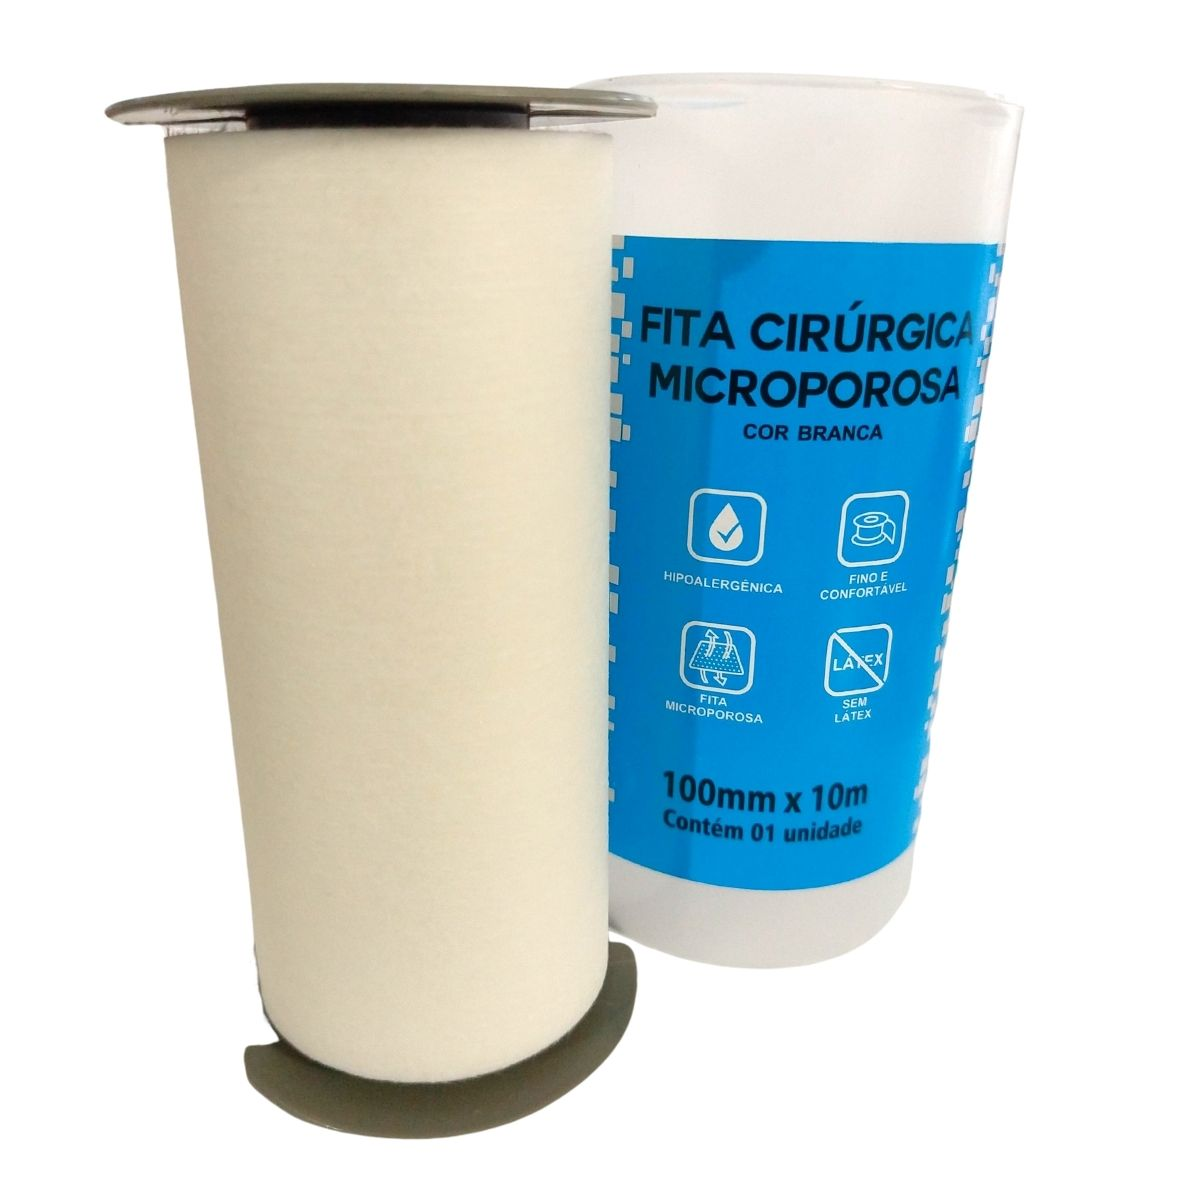 Fita Cirúrgica Microporosa Branca 10mmX10m Ciex- 06 Unidades